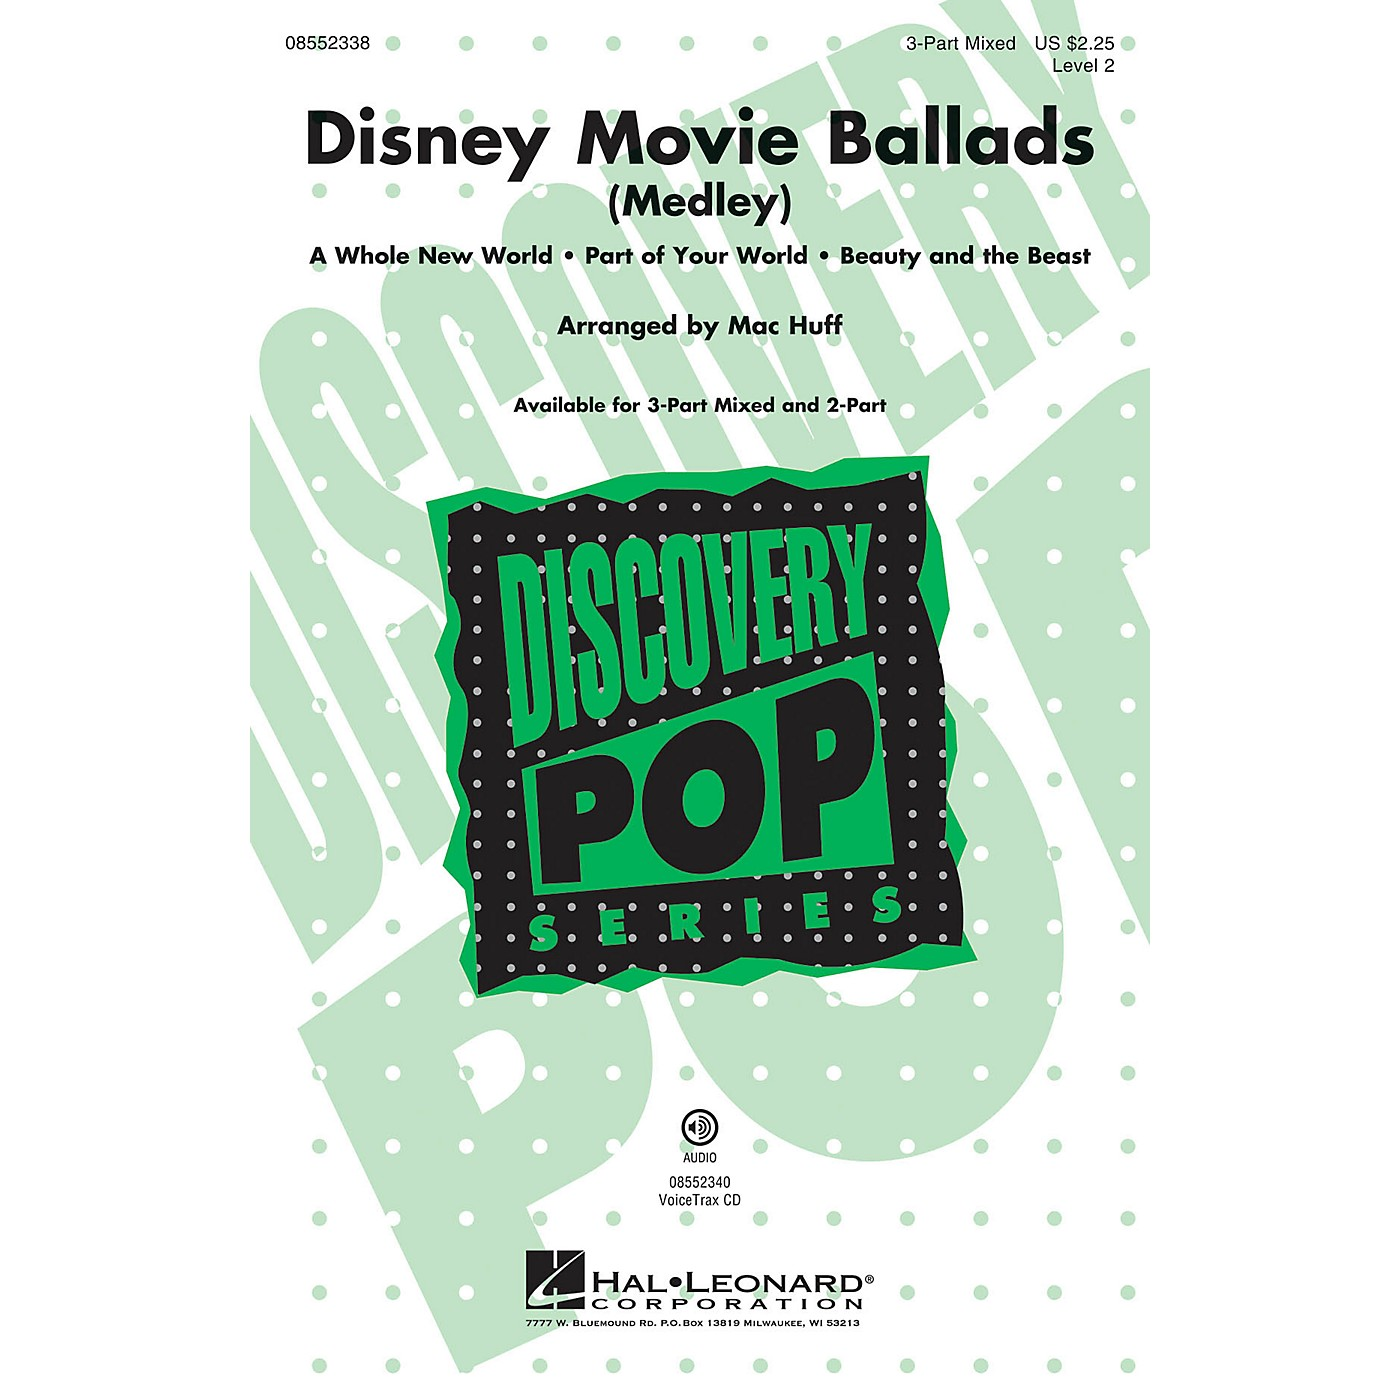 Hal Leonard Disney Movie Ballads (Medley) Discovery Level 2 VoiceTrax CD Arranged by Mac Huff thumbnail